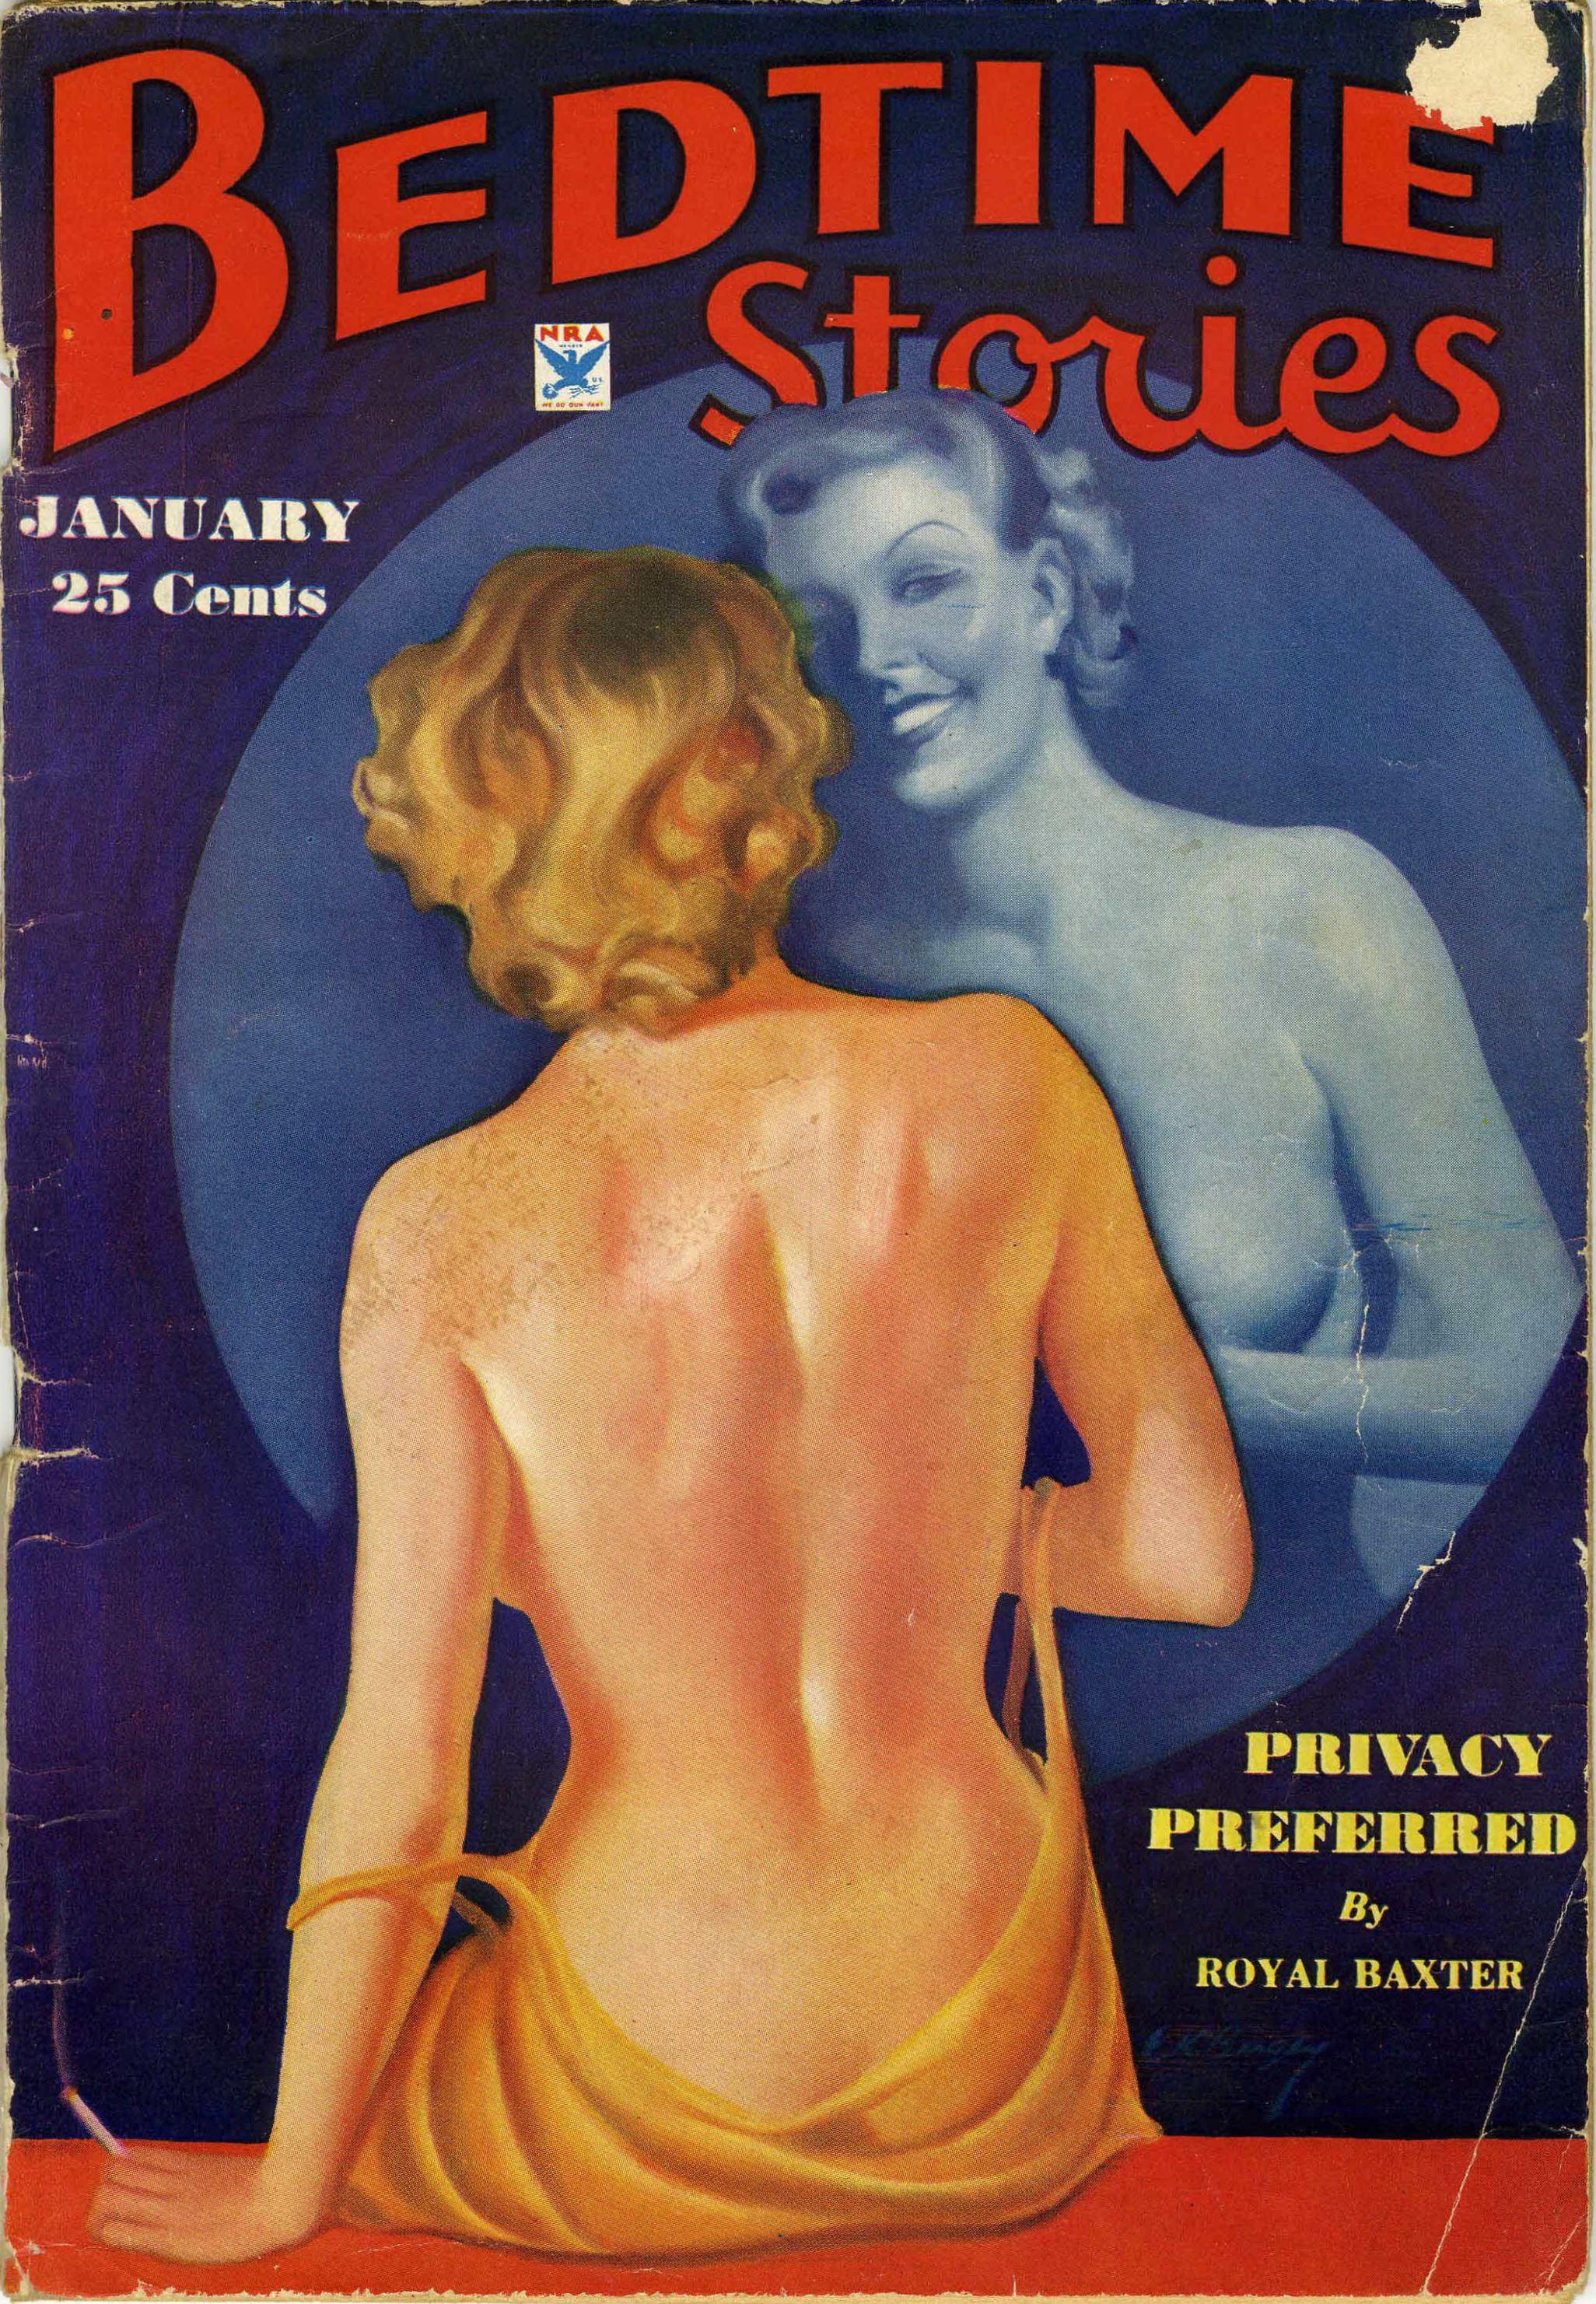 33089872-Bedtime_Stories_V3#4_(Detinuer_Publishing_Co.,_1935)